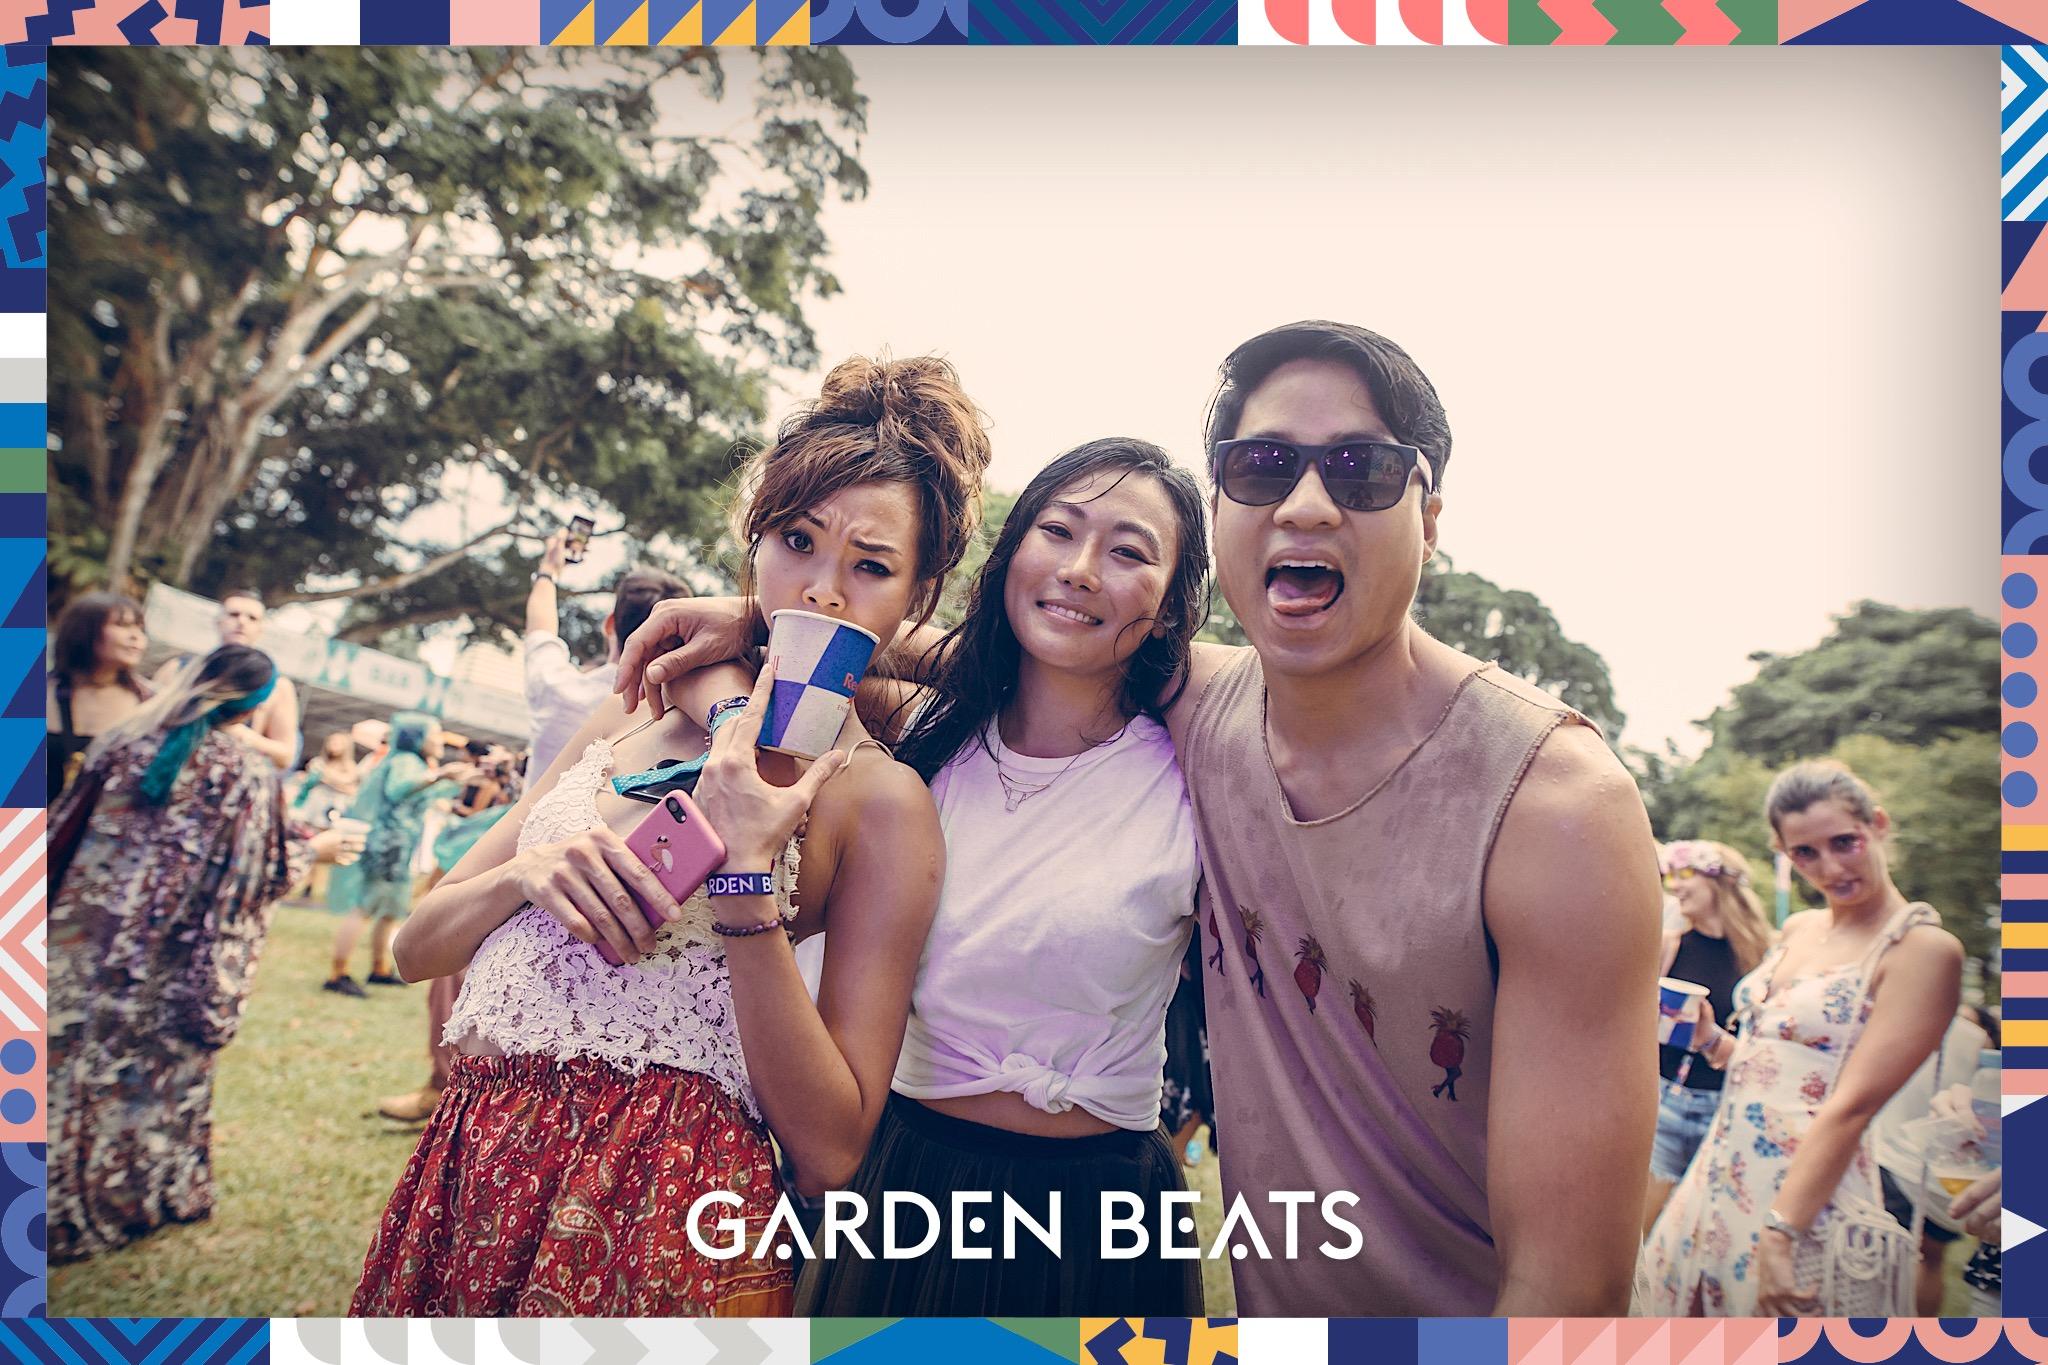 03032018_GardenBeats_Colossal548_Watermarked.jpg